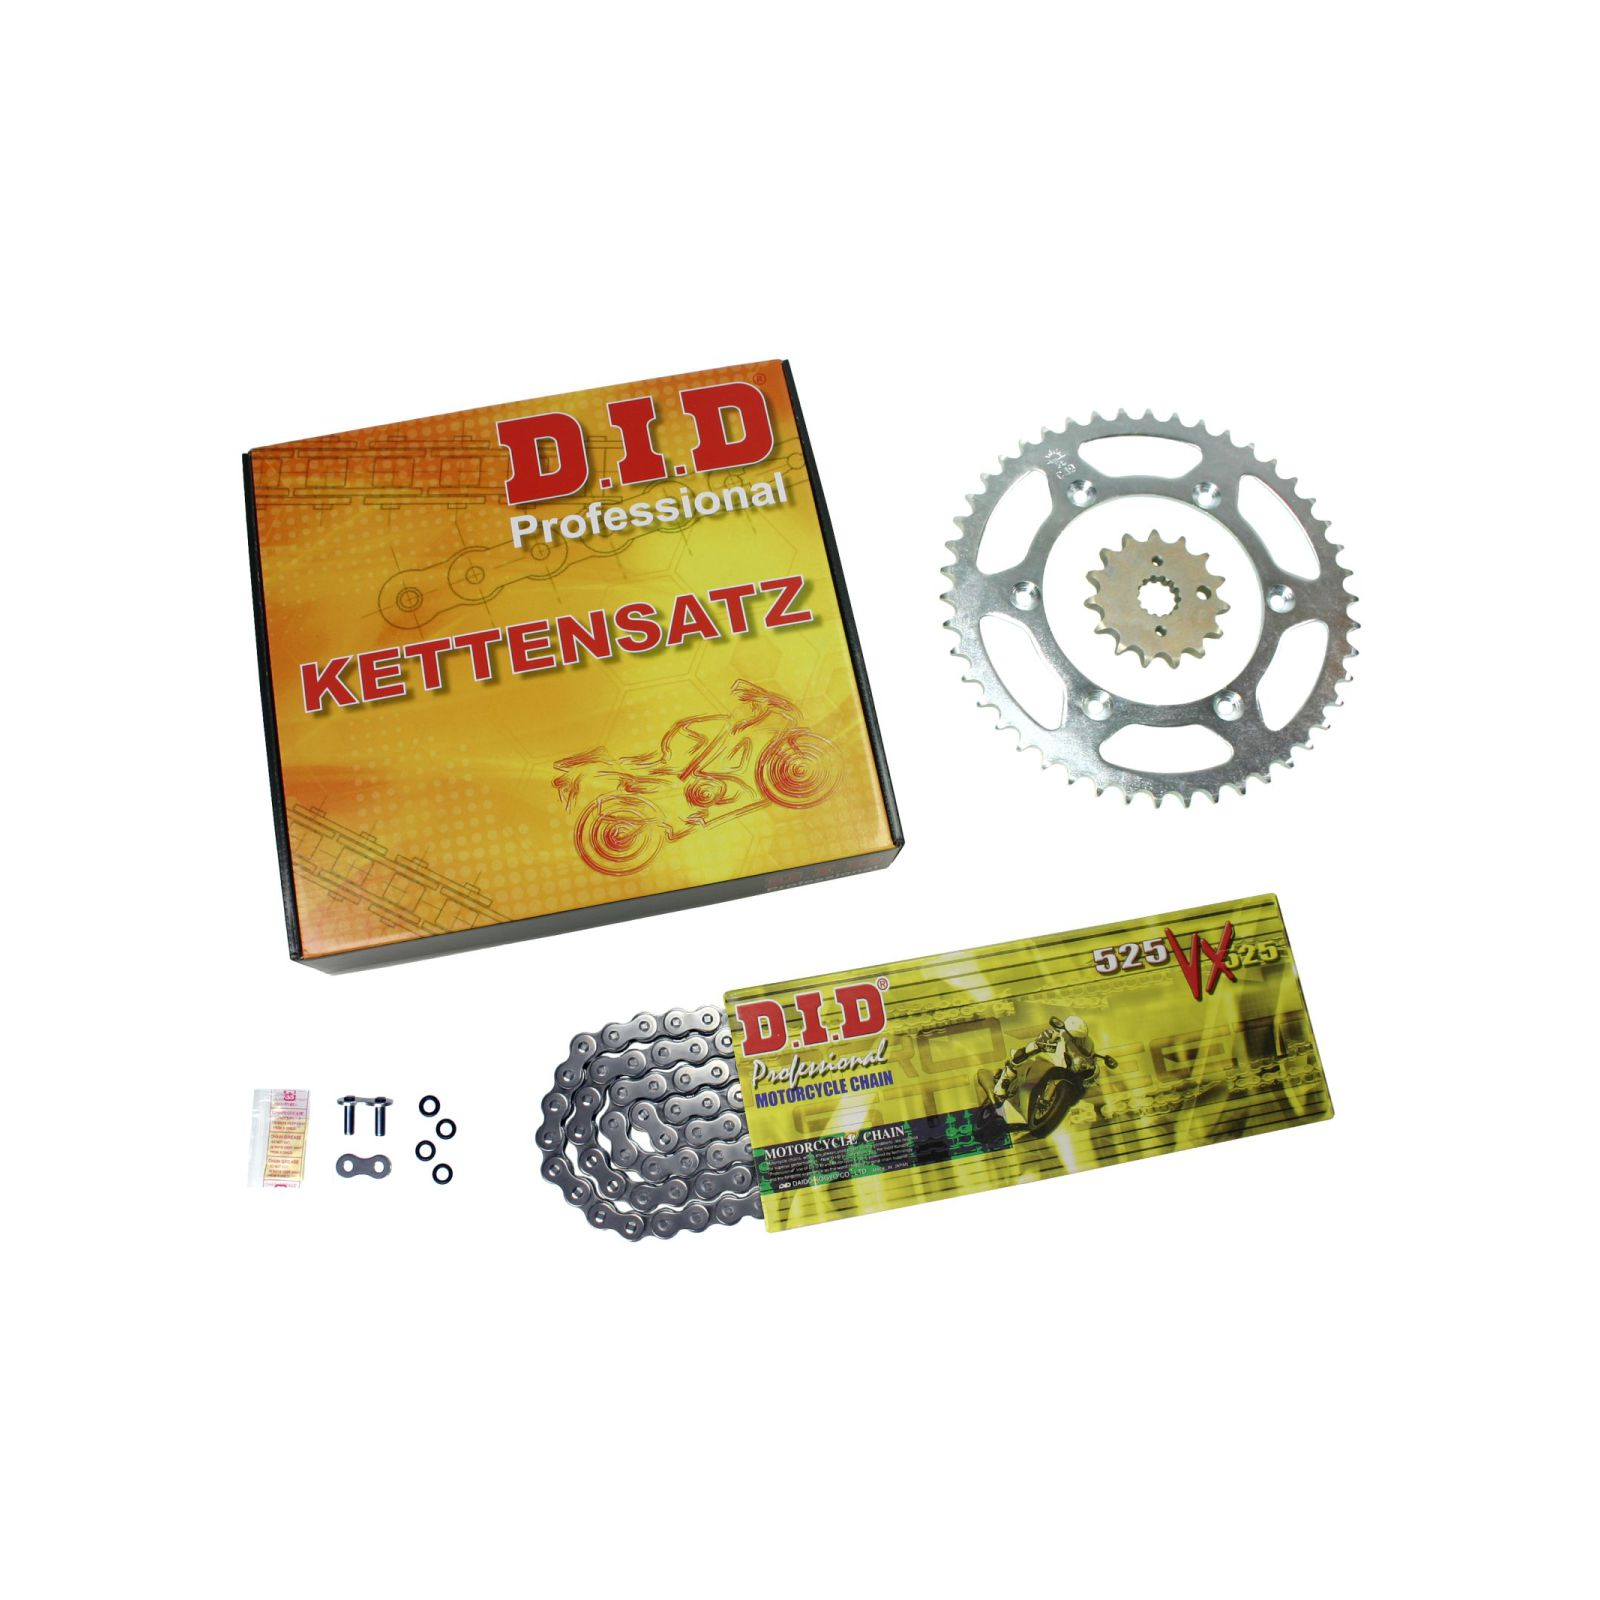 DID-VX-Kettensatz-Honda-CB-450-S-20-kW-Bj-86-89-PC17